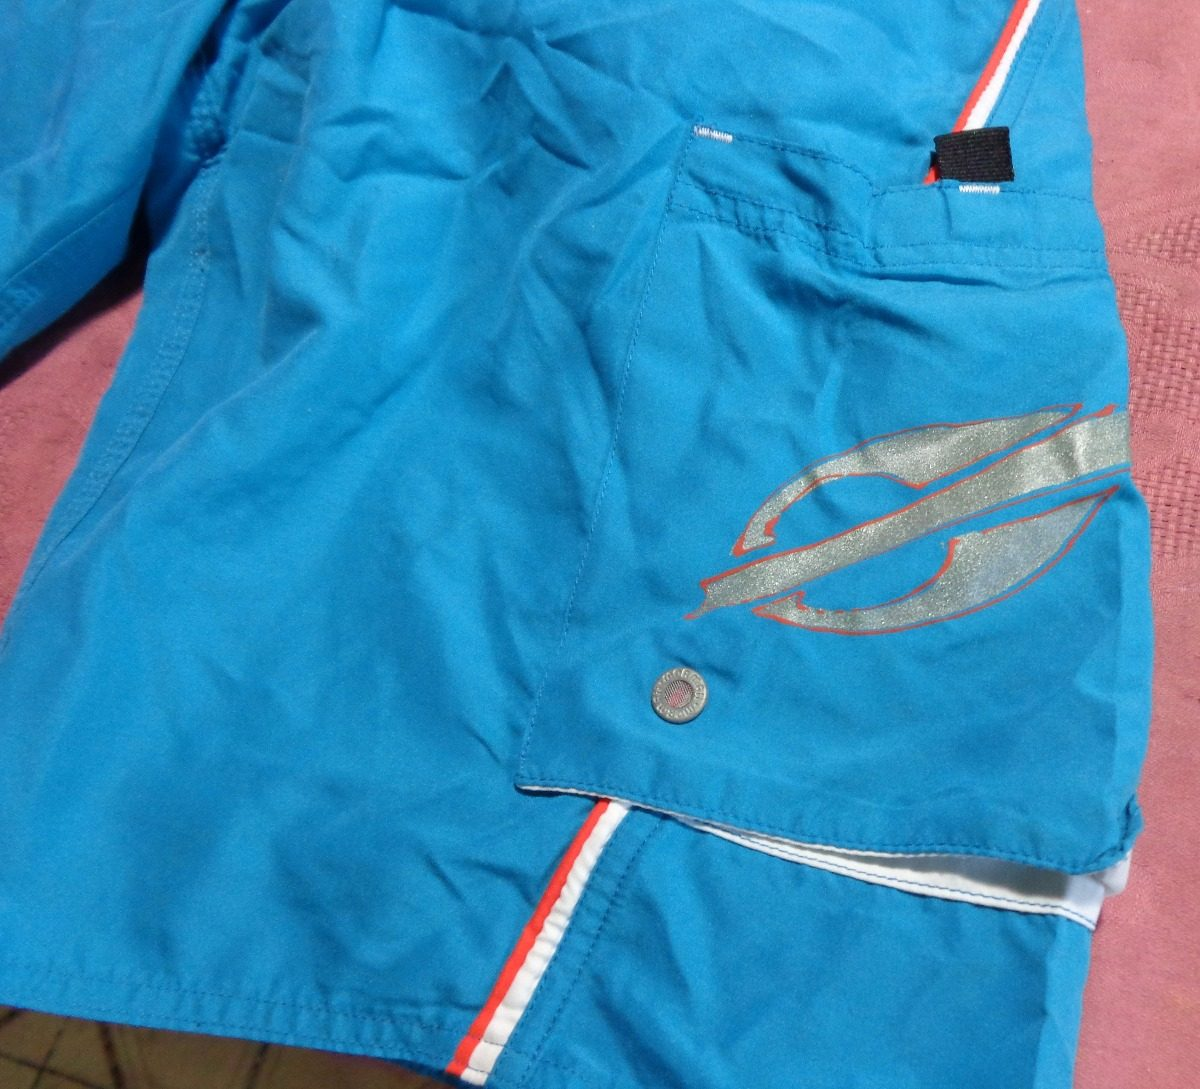 Inmejorable Precio!   400 Pantalon Bermuda De Baño Mormaii -   400 ... 6ca5d7a8b4